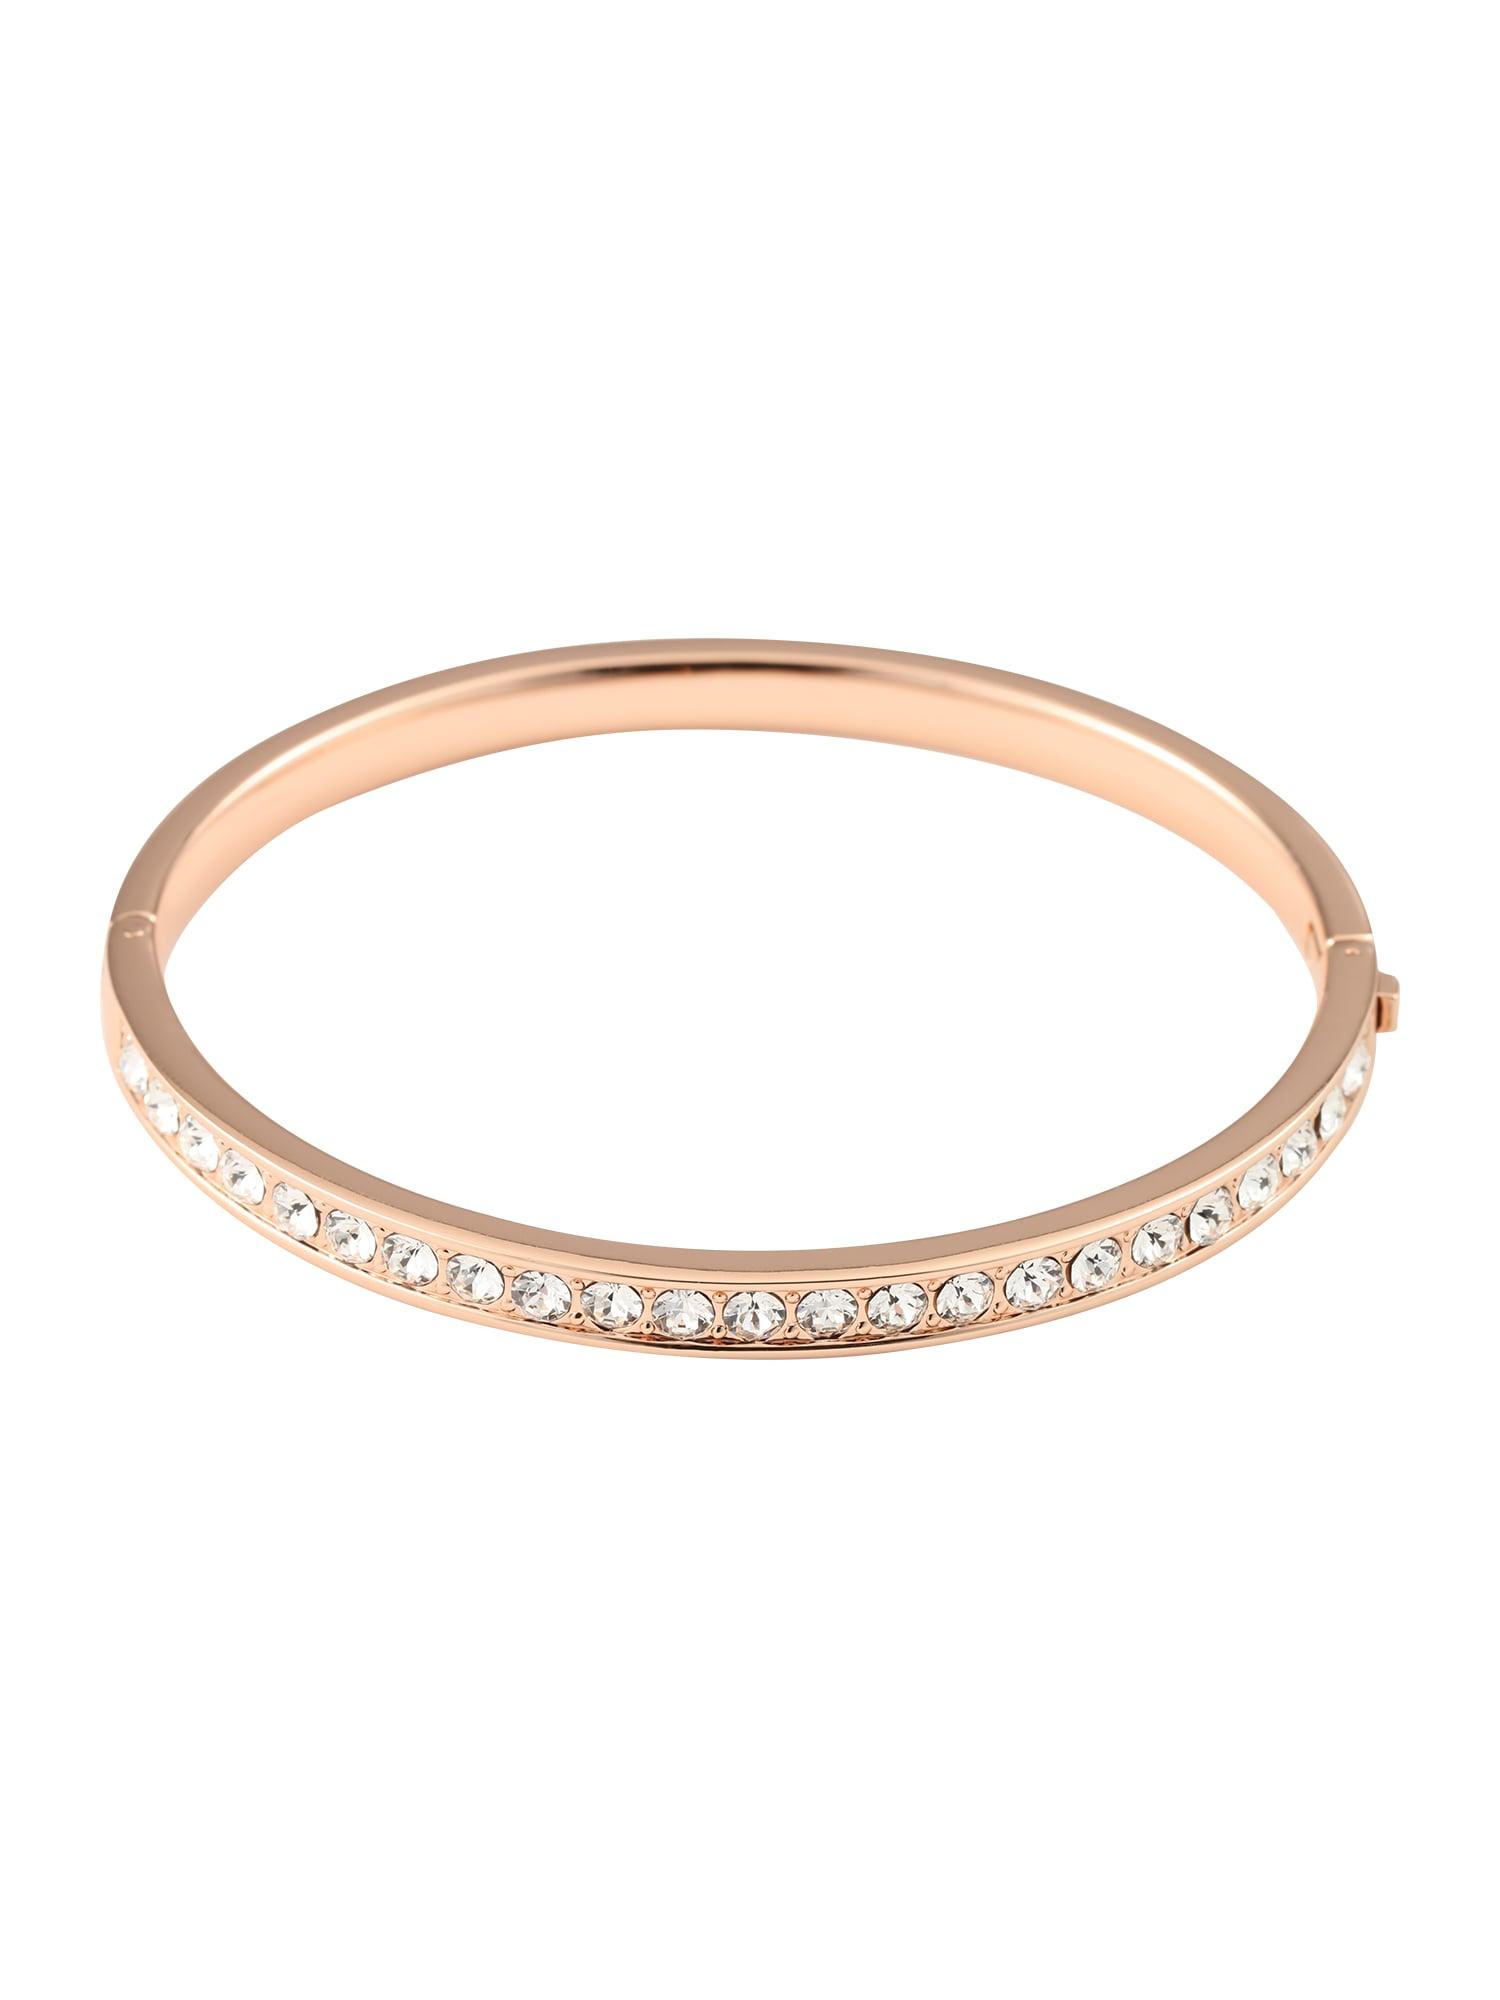 Damen Ted Baker Ring 'CLEMARA: HINGE CRYSTAL BANGLE' gold | 05055336355992